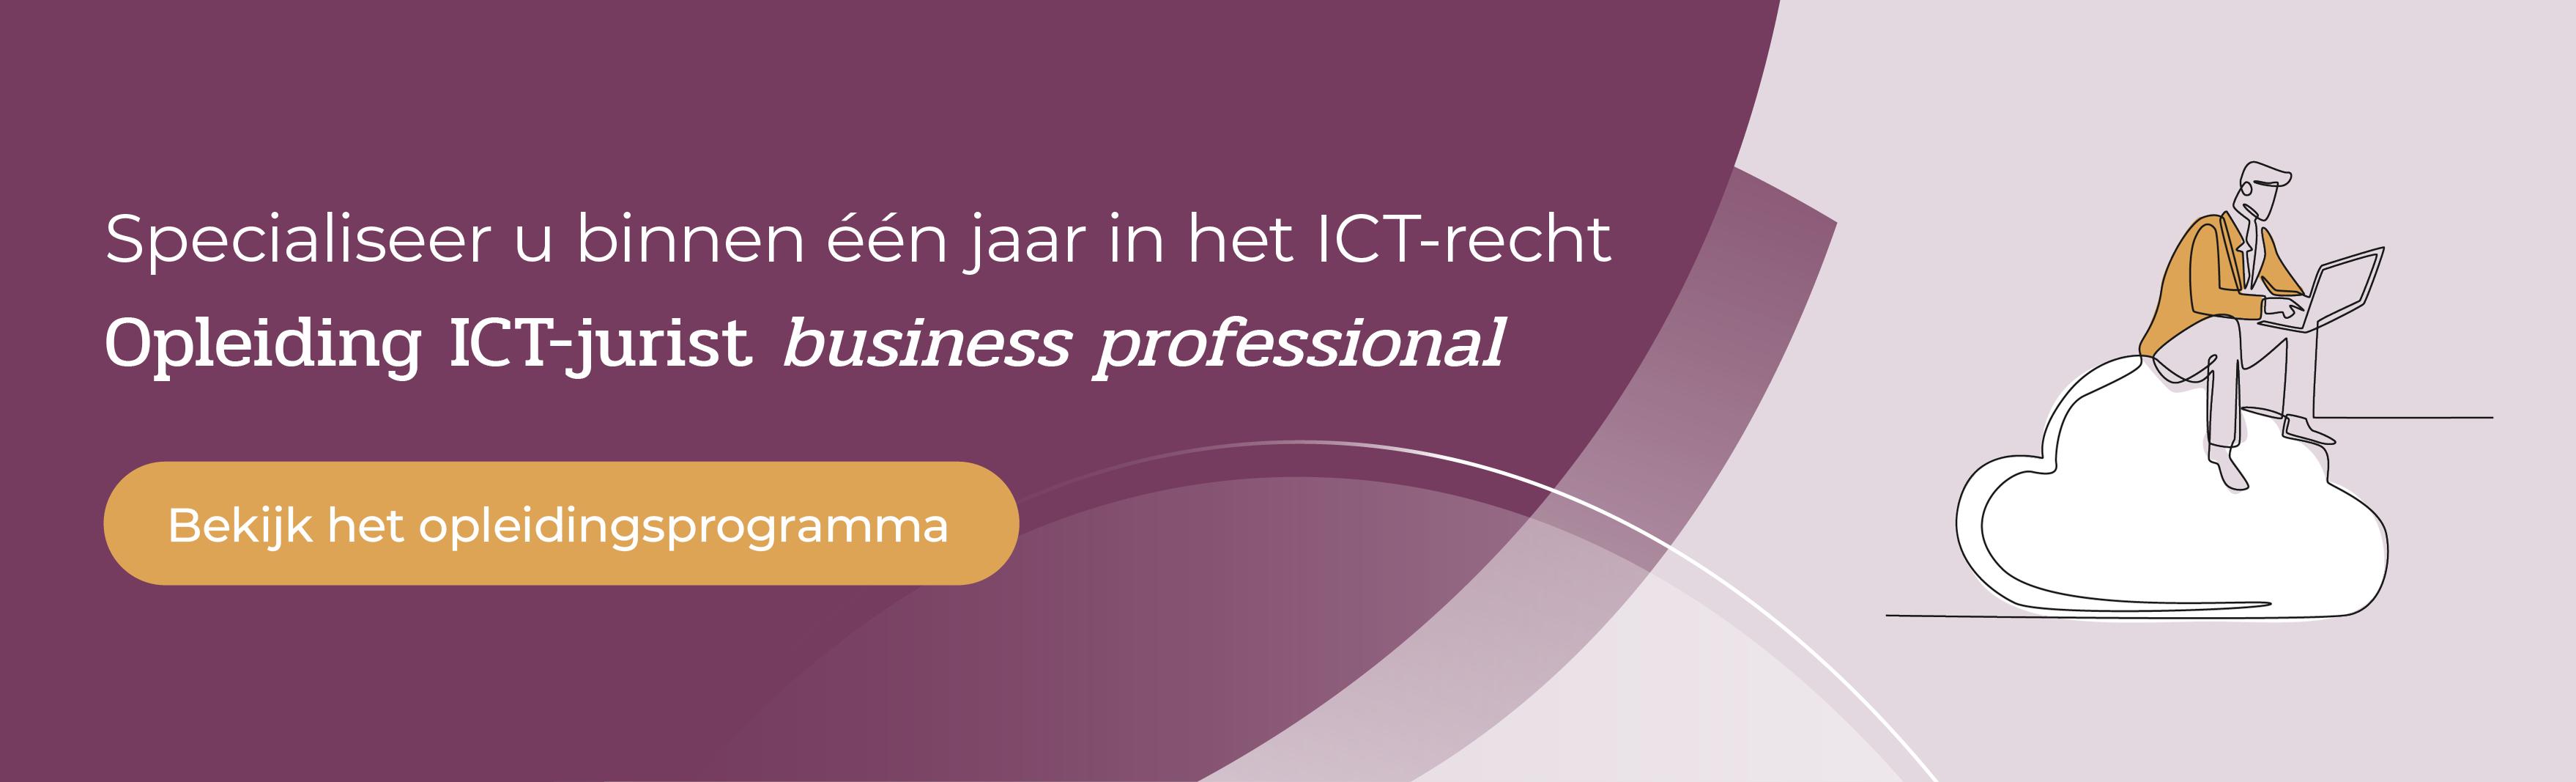 Opleiding ICT-jurist